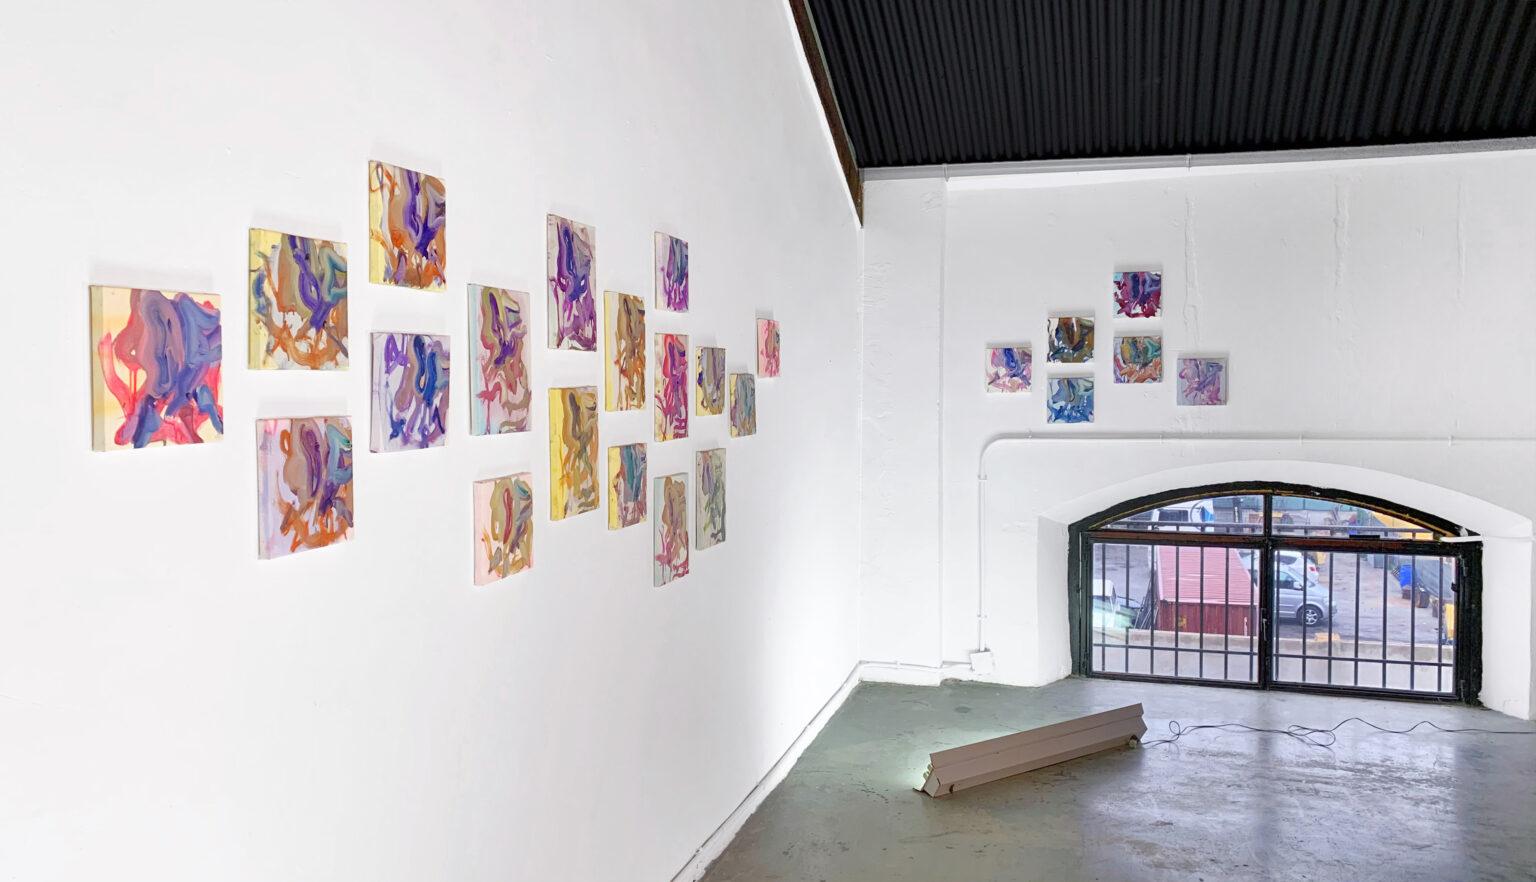 Han Bing - Suburbia Contemporary